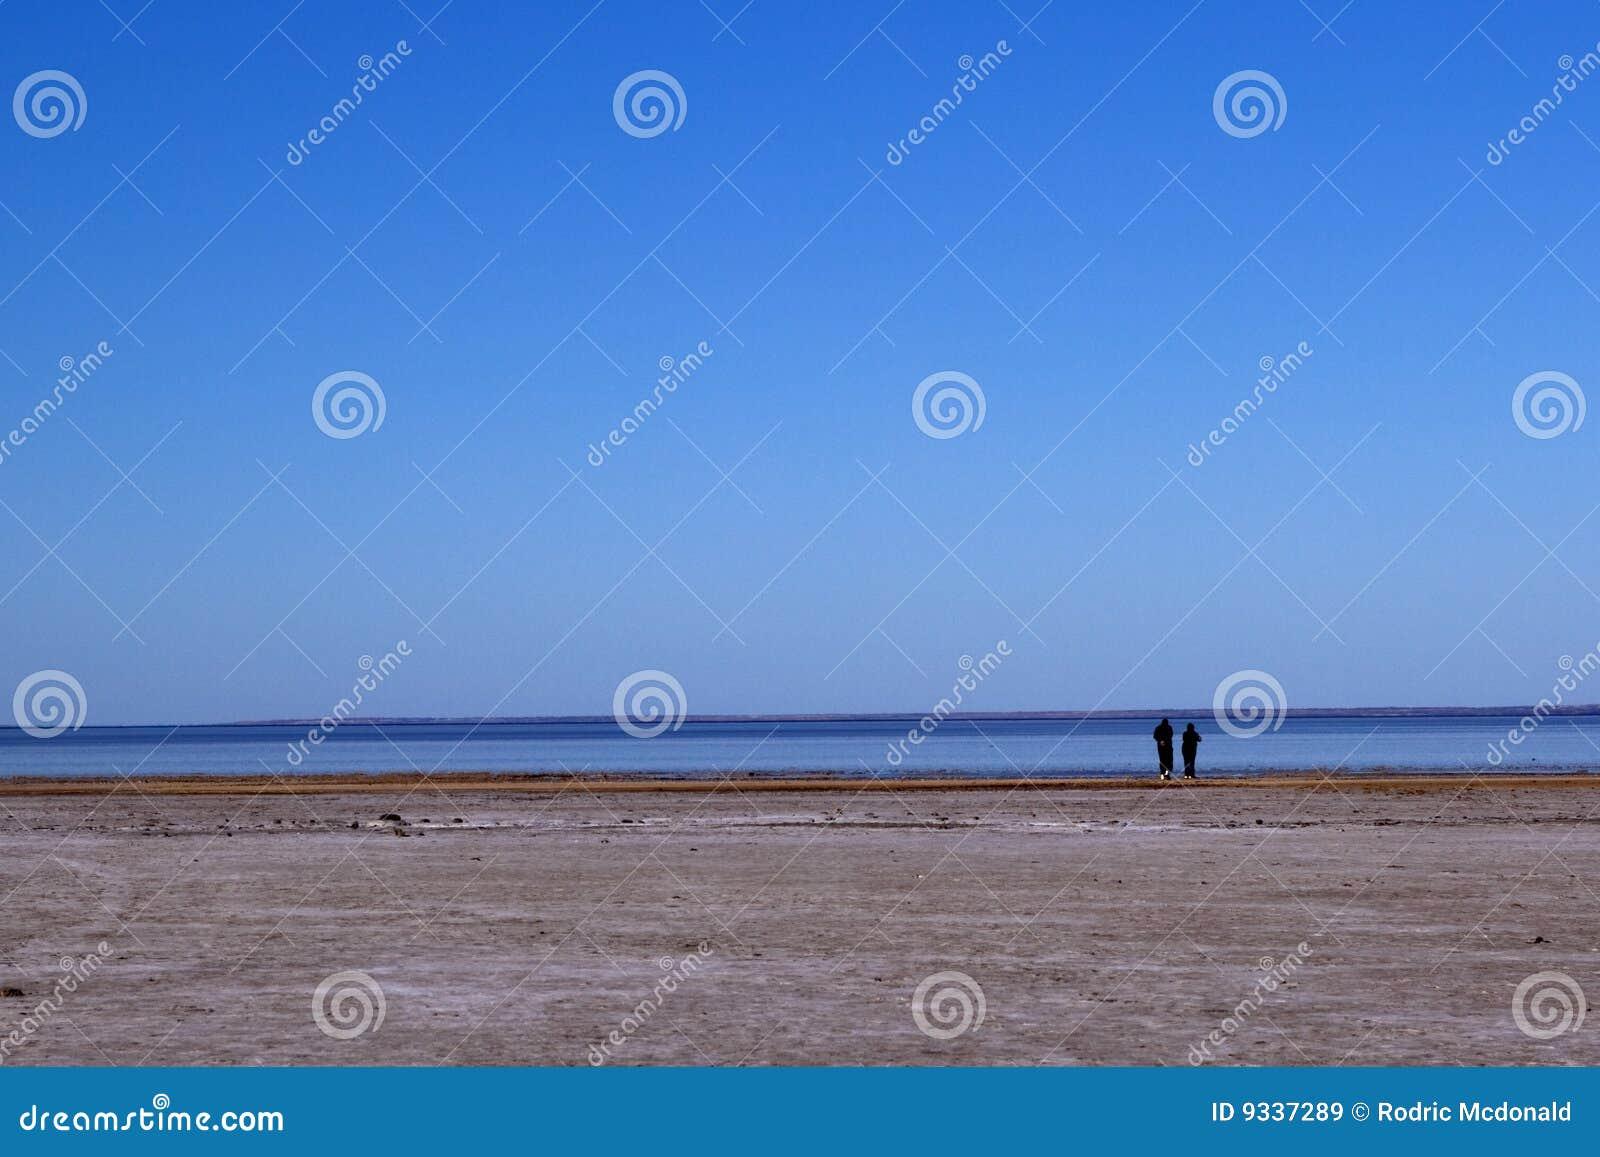 Lake Eyre Central Australia